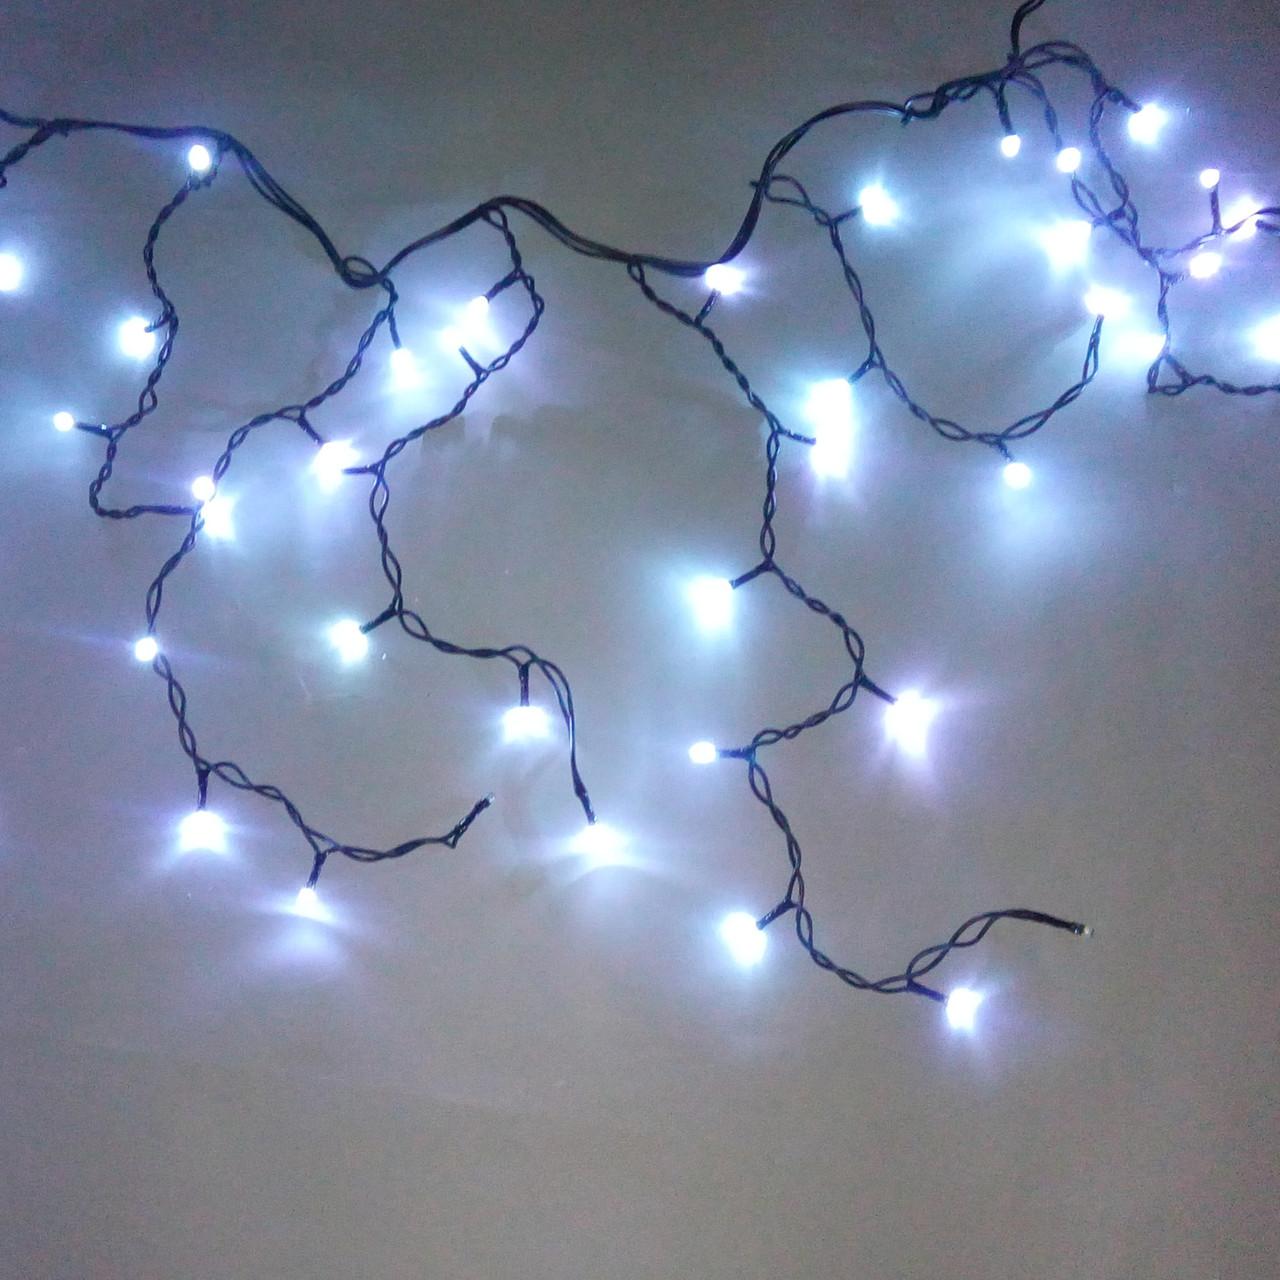 Светодиодная гирлянда Бахрома Flash, 3х0.5 м, 200 LED, ПВХ